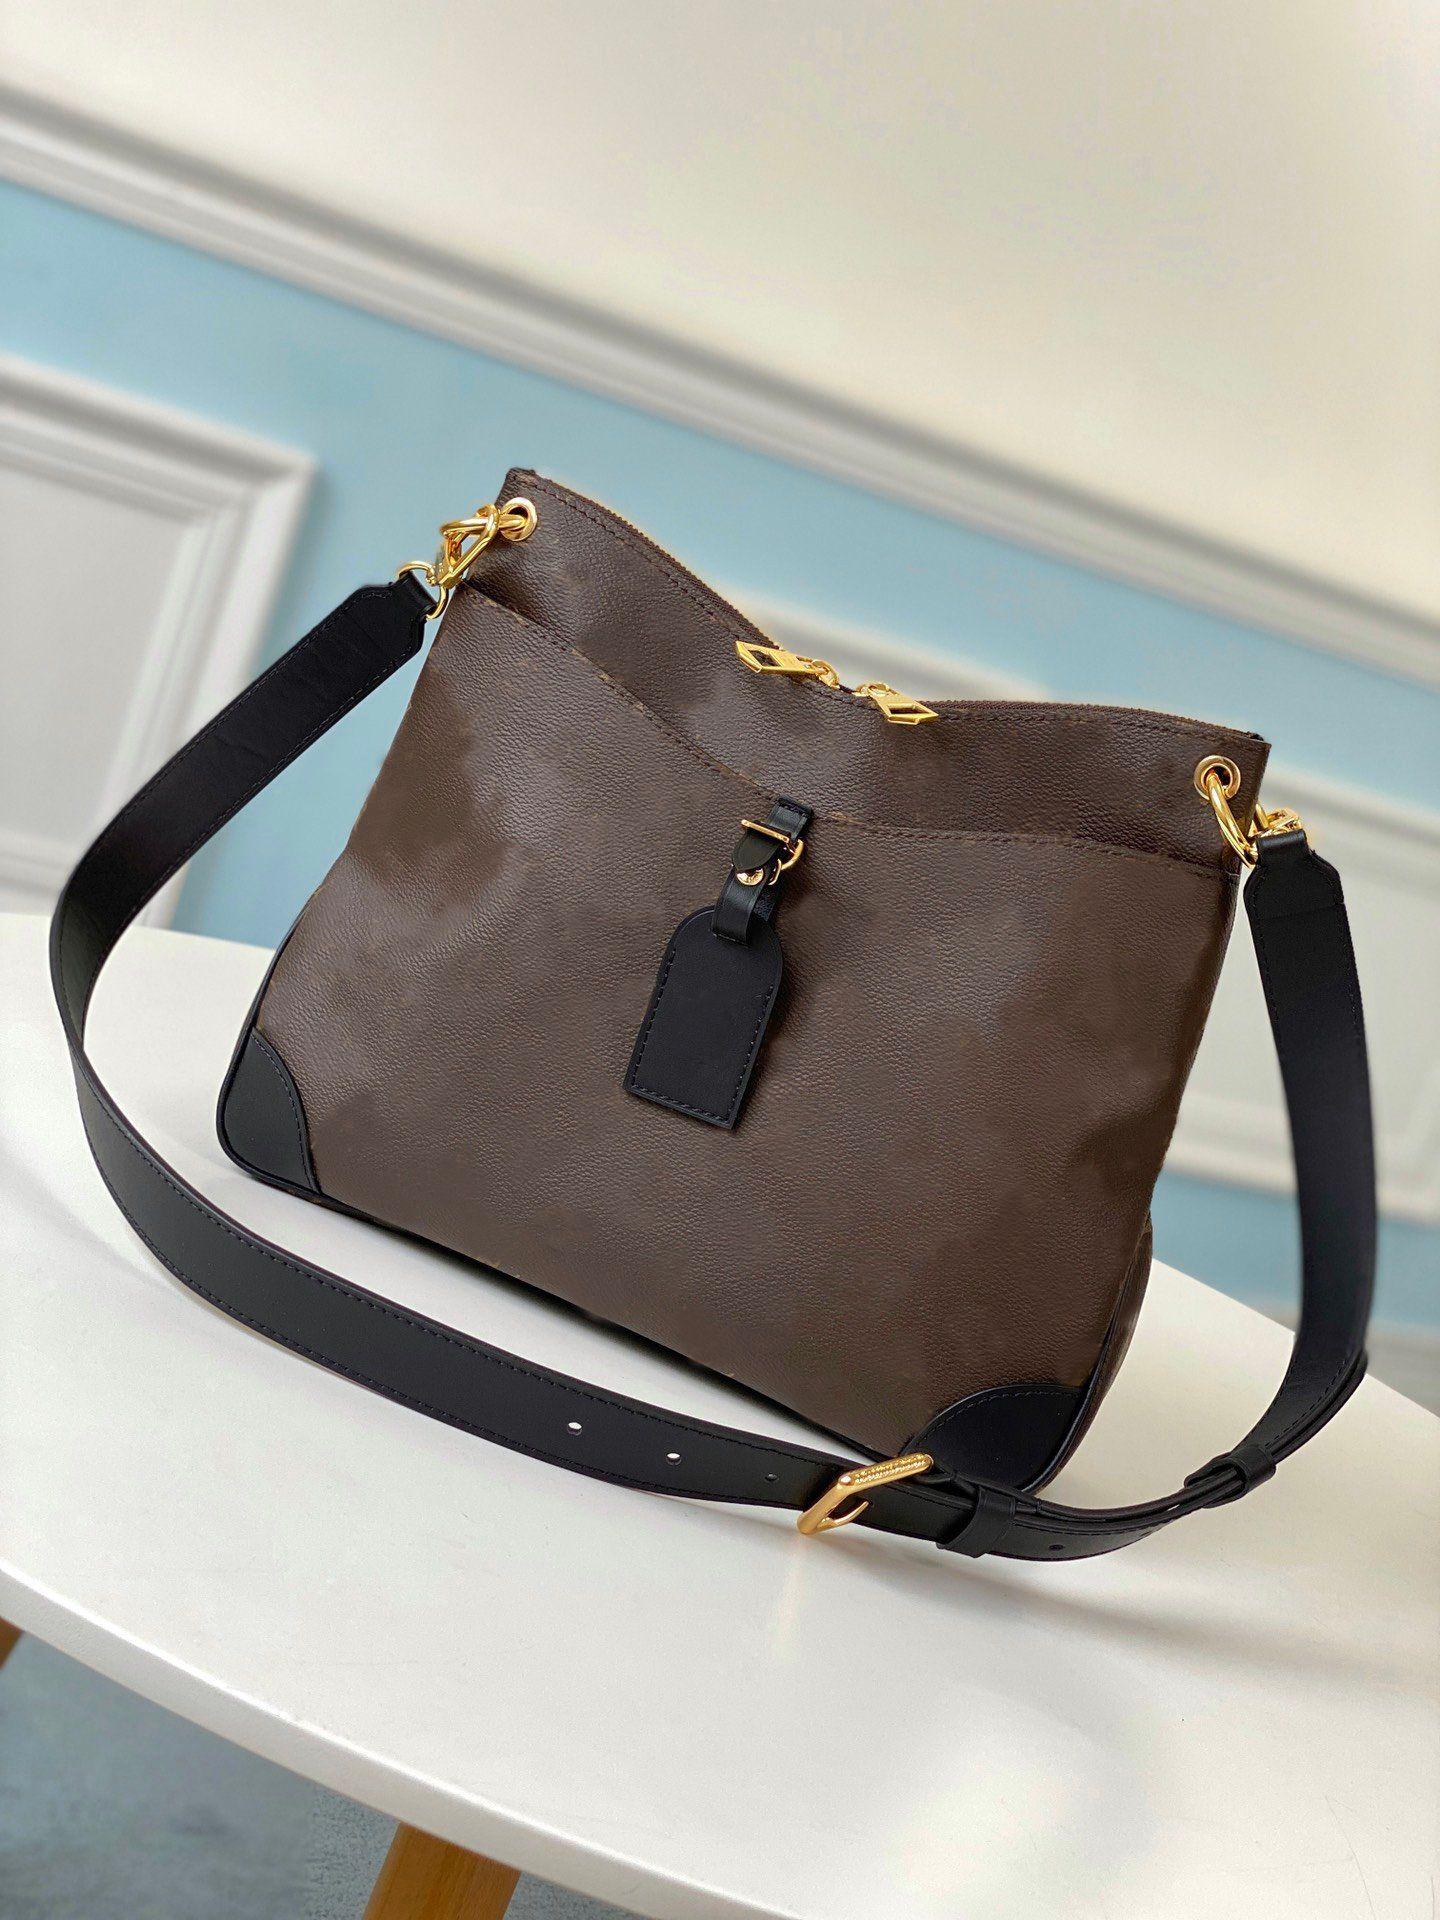 Monedero 2021 M45353 Messenger Designers Bag Bolsos de lujo Bolsas de hombro Cuero Crossbody Moda Bolso de moda Mujeres Odeon Bolsos Totes Wallet M45355 UGHH